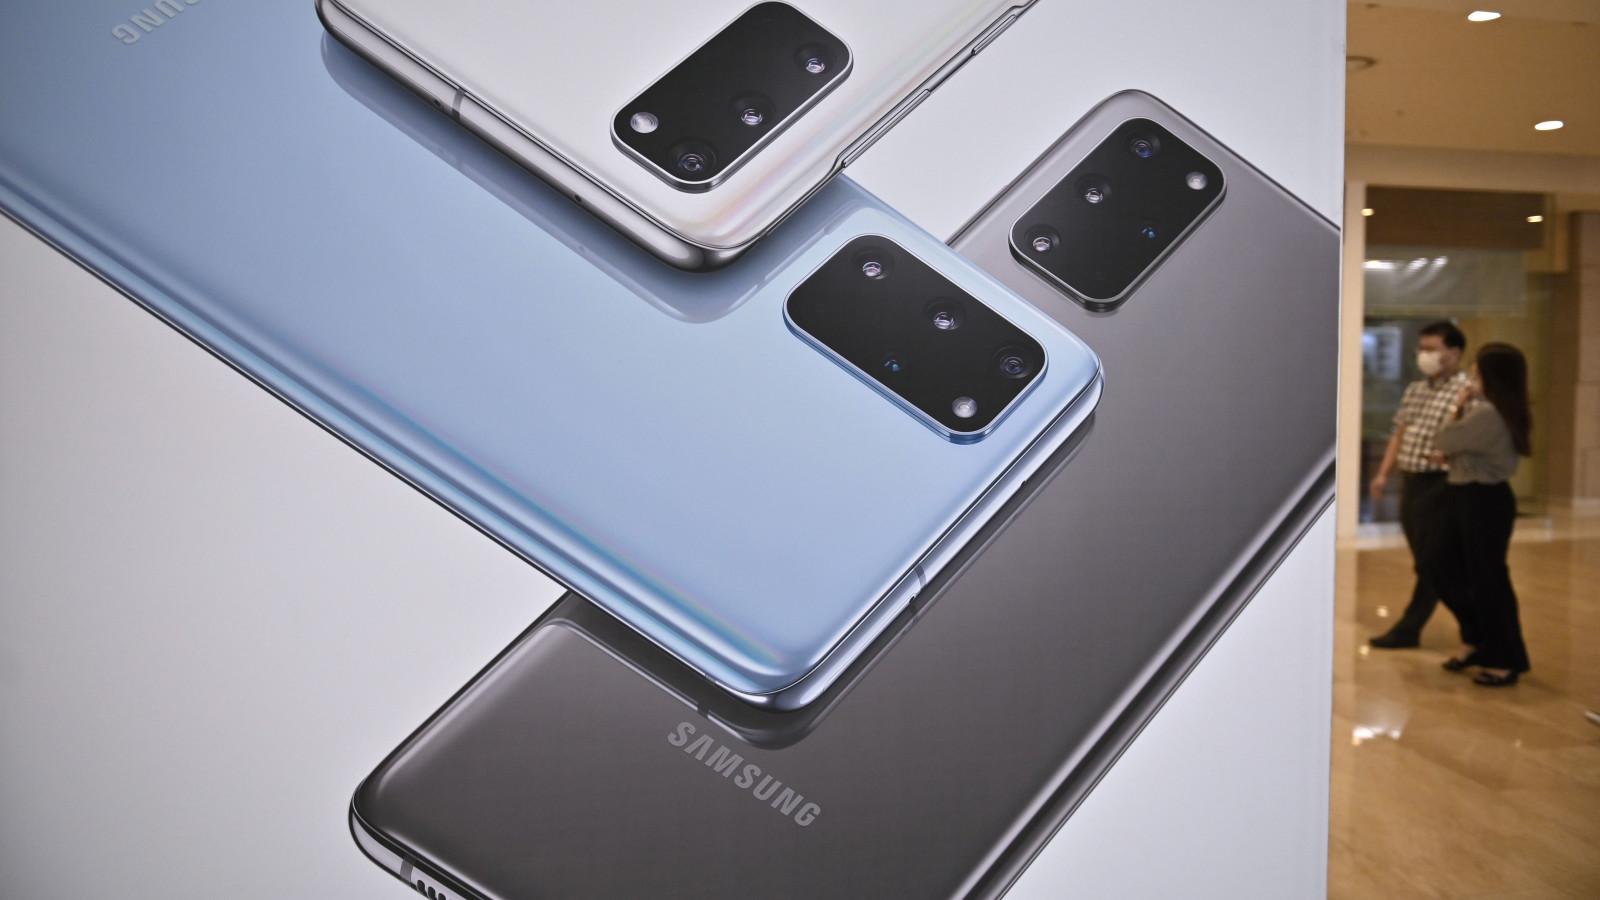 Am 14. Januar 2021 präsentiert Samsung das Galaxy S21 Smartphone